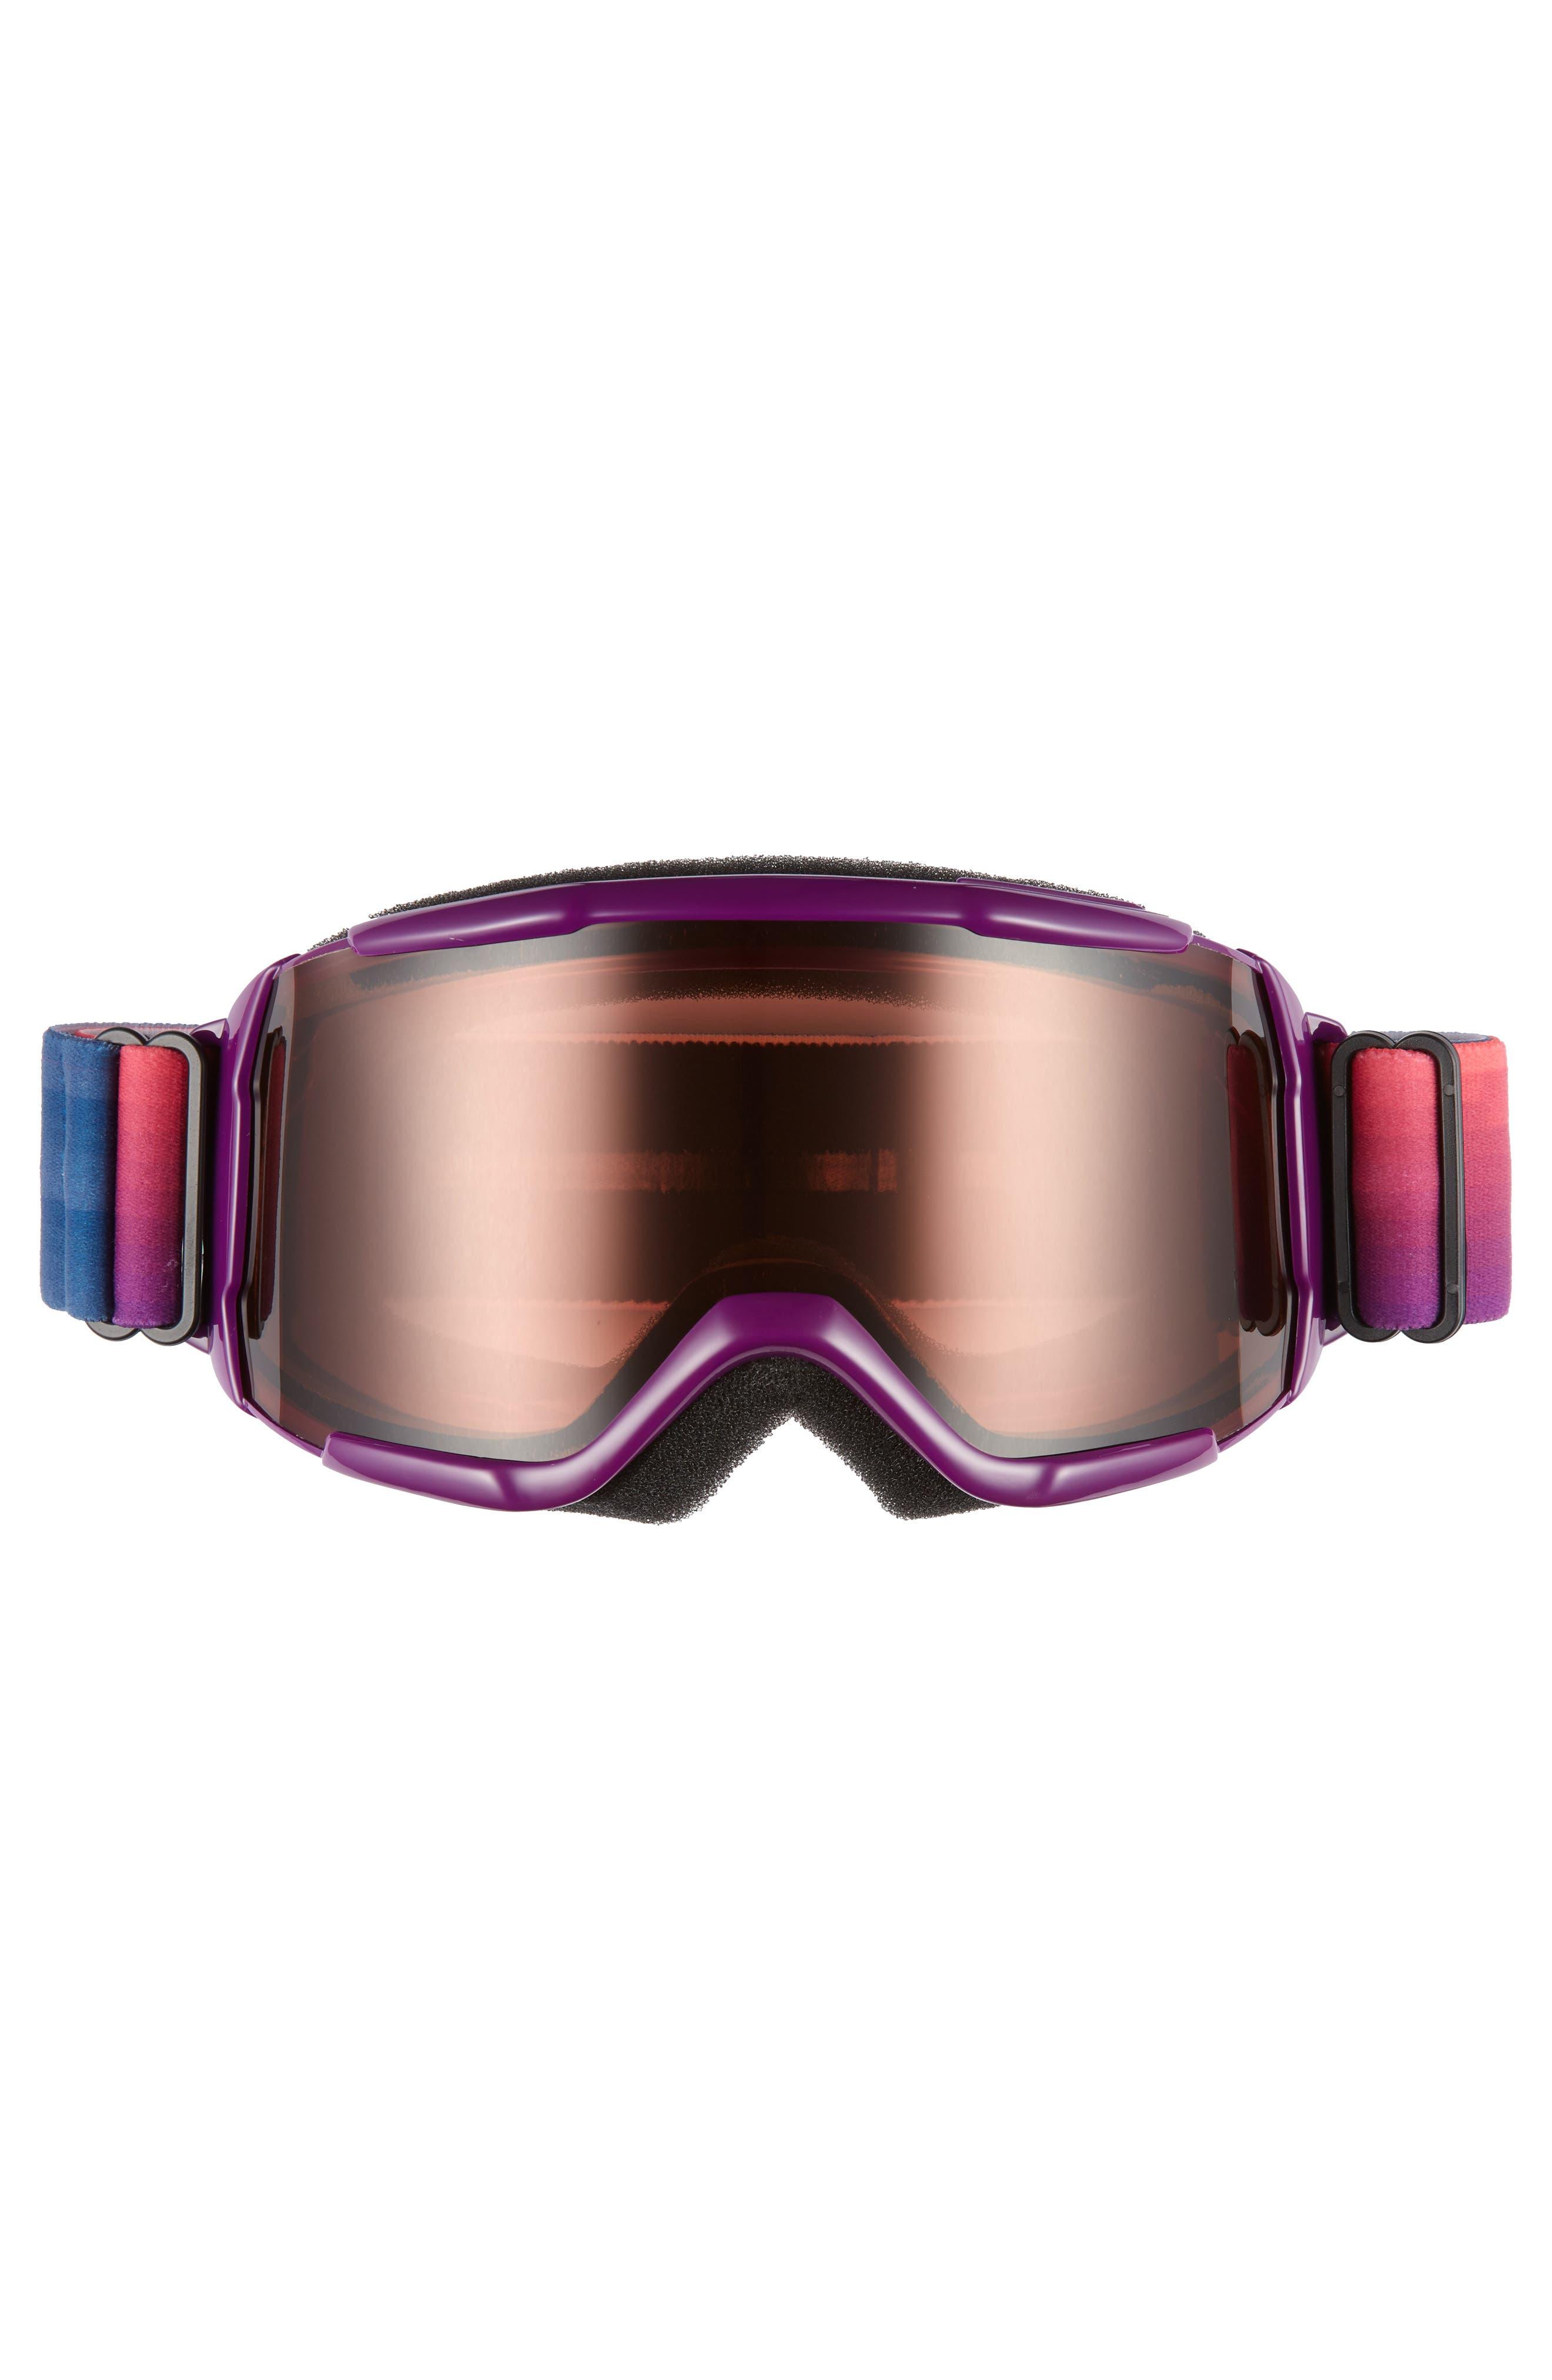 Daredevil 170mm Snow Goggles,                             Alternate thumbnail 3, color,                             MONARCH RESET